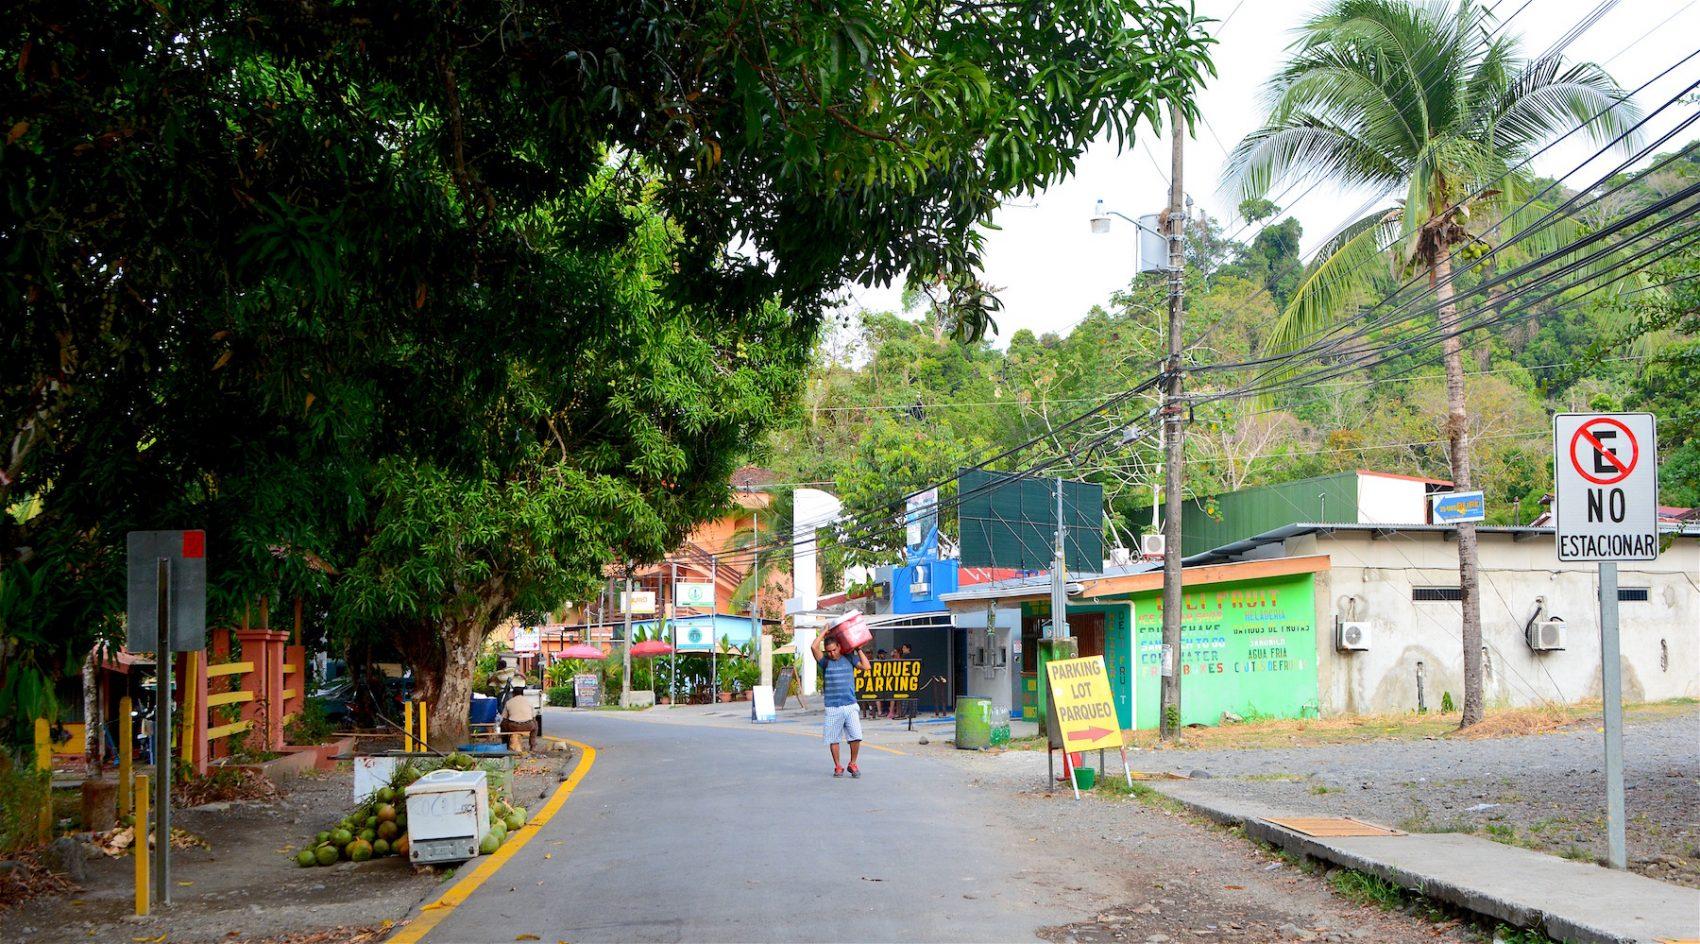 Parc Manuel Antonio